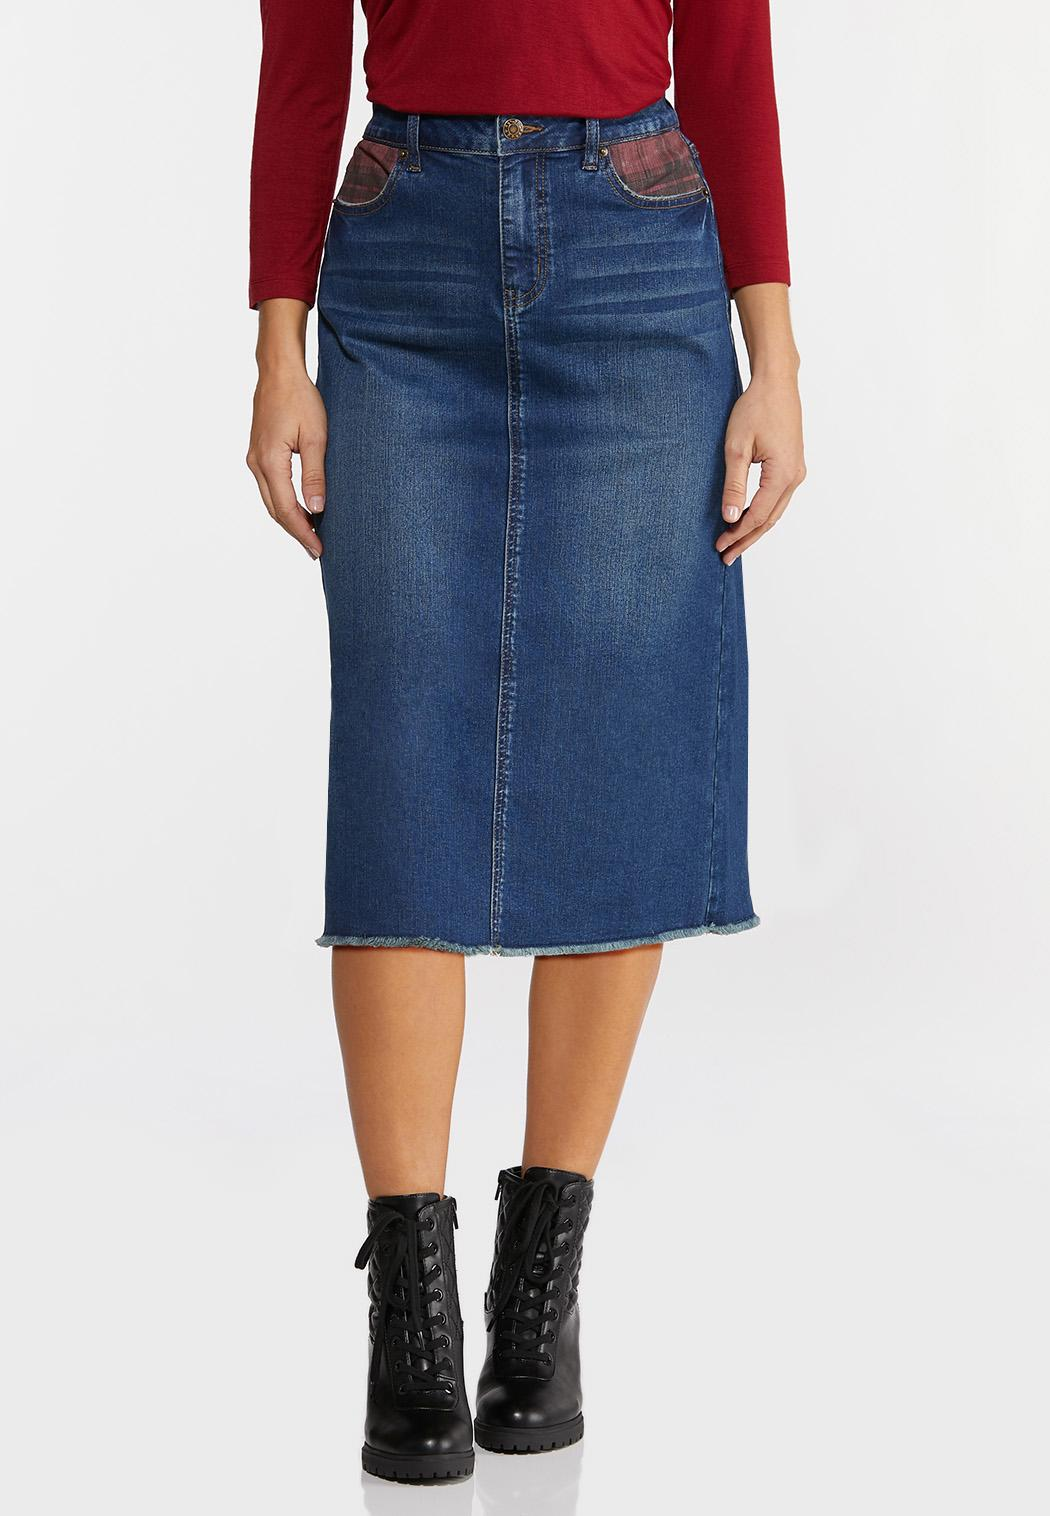 Plus Size Plaid Pocket Denim Skirt